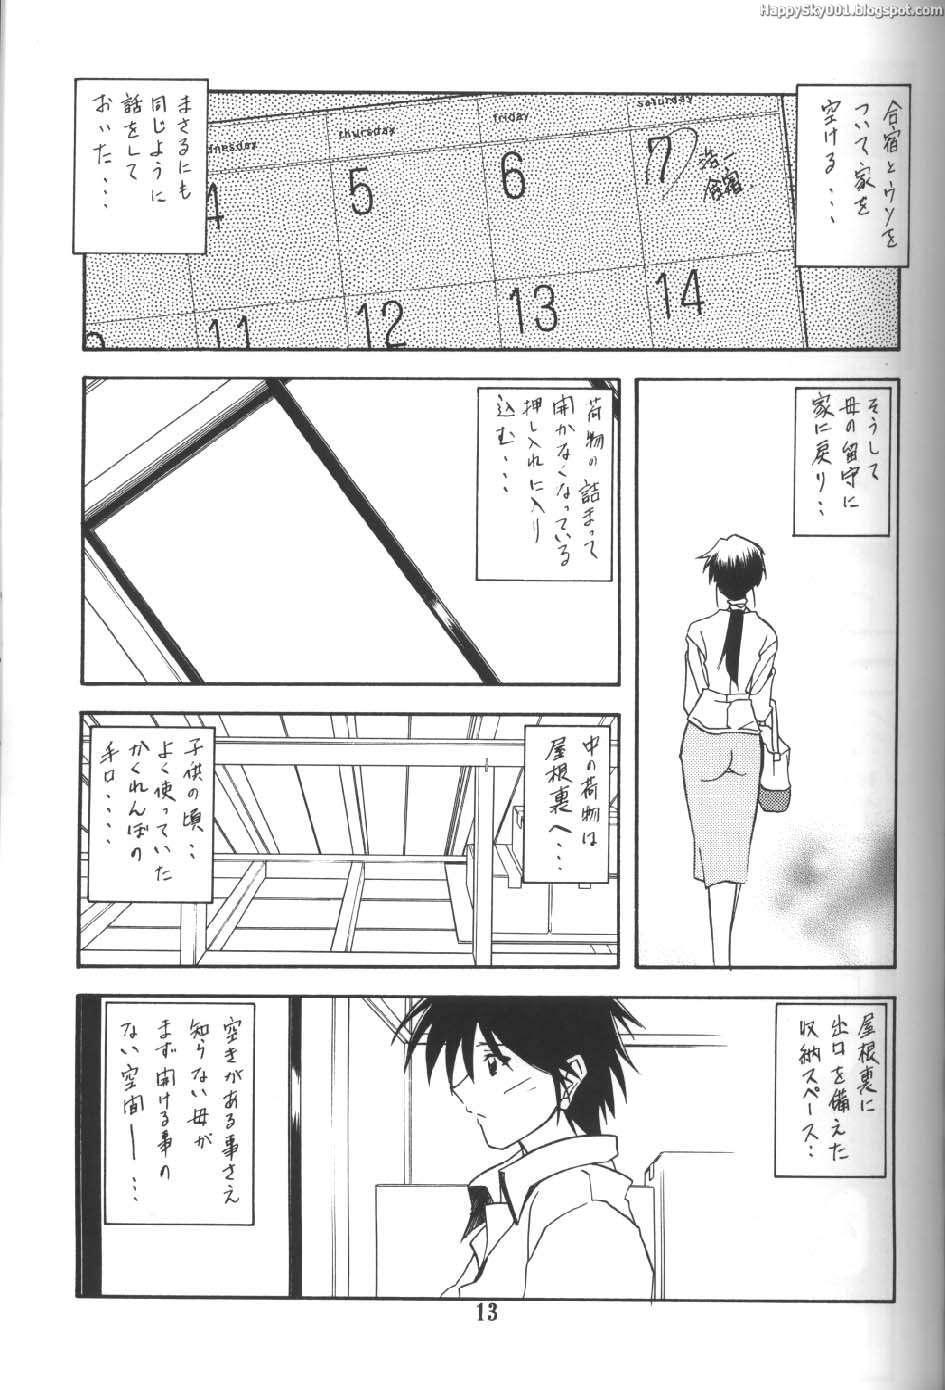 Yama Hime no Mi 11